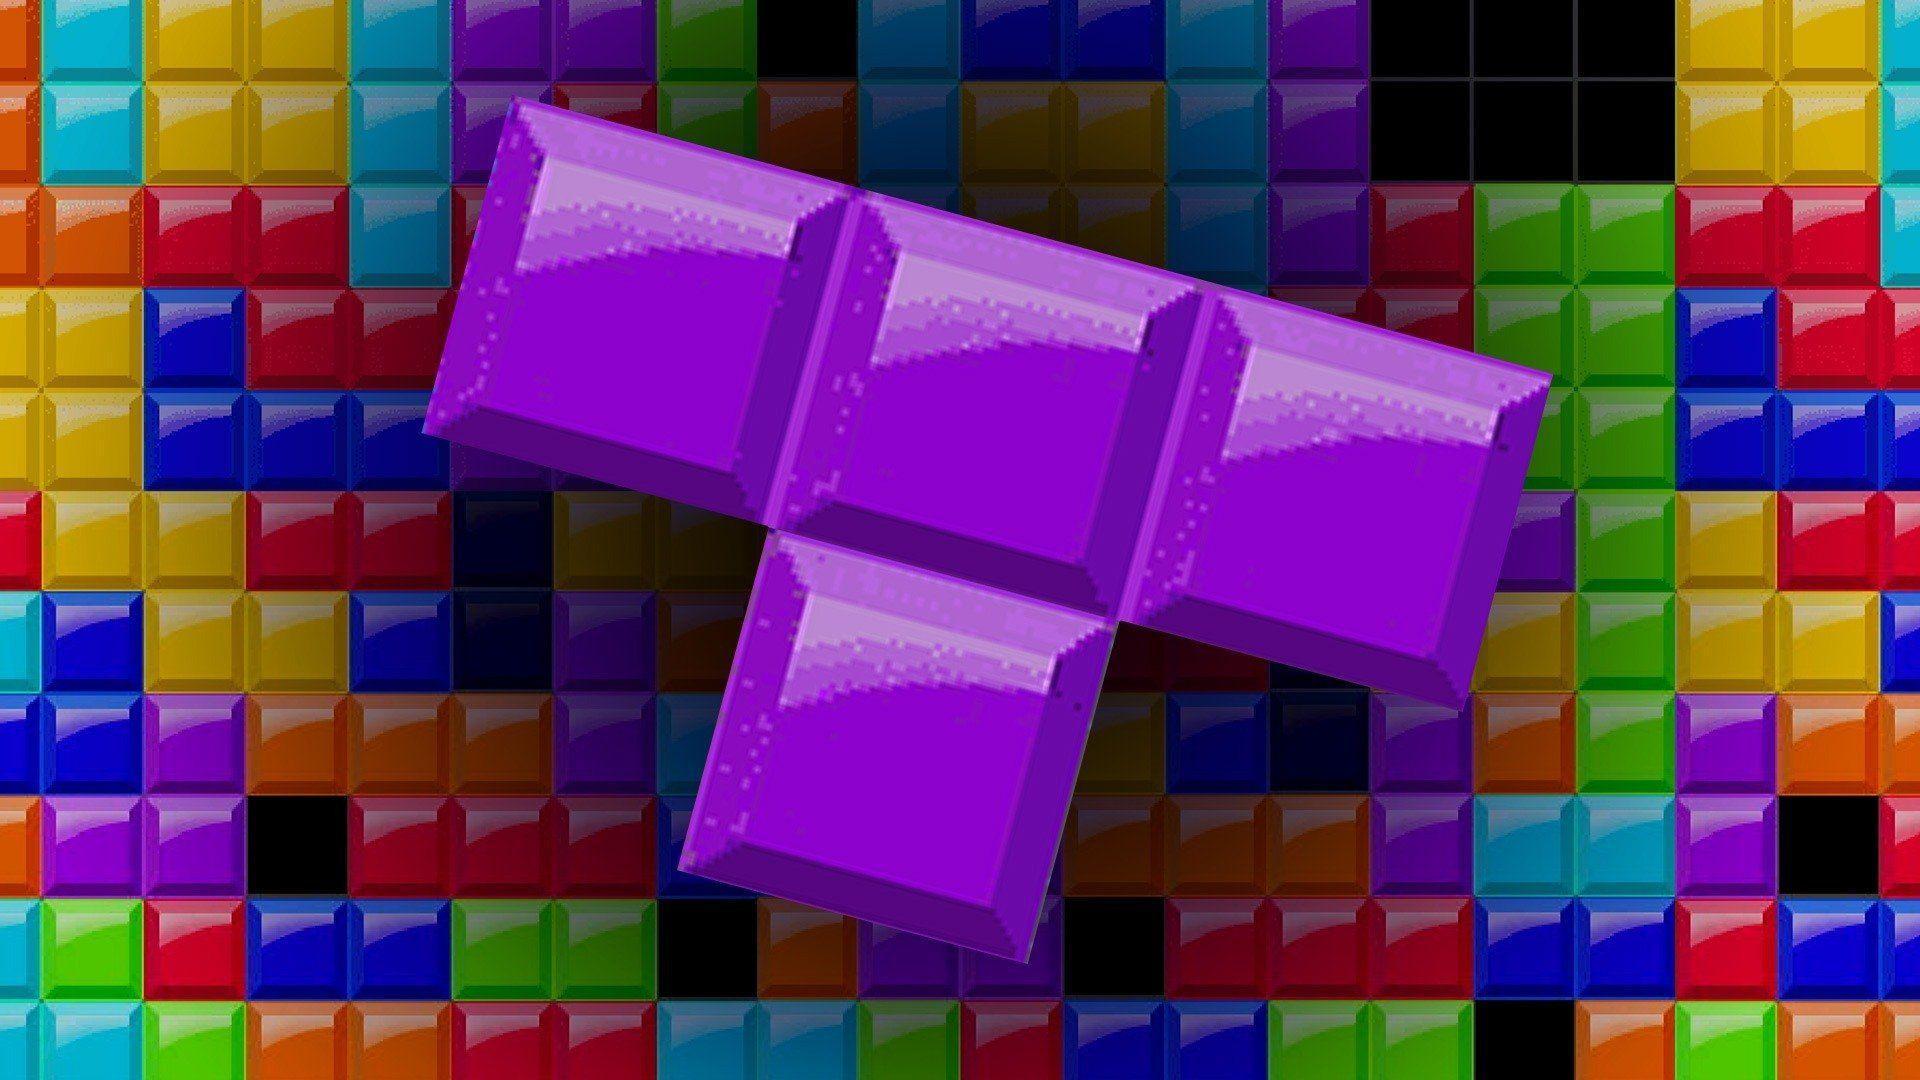 Tetris 99 Wallpapers - Wallpaper Cave